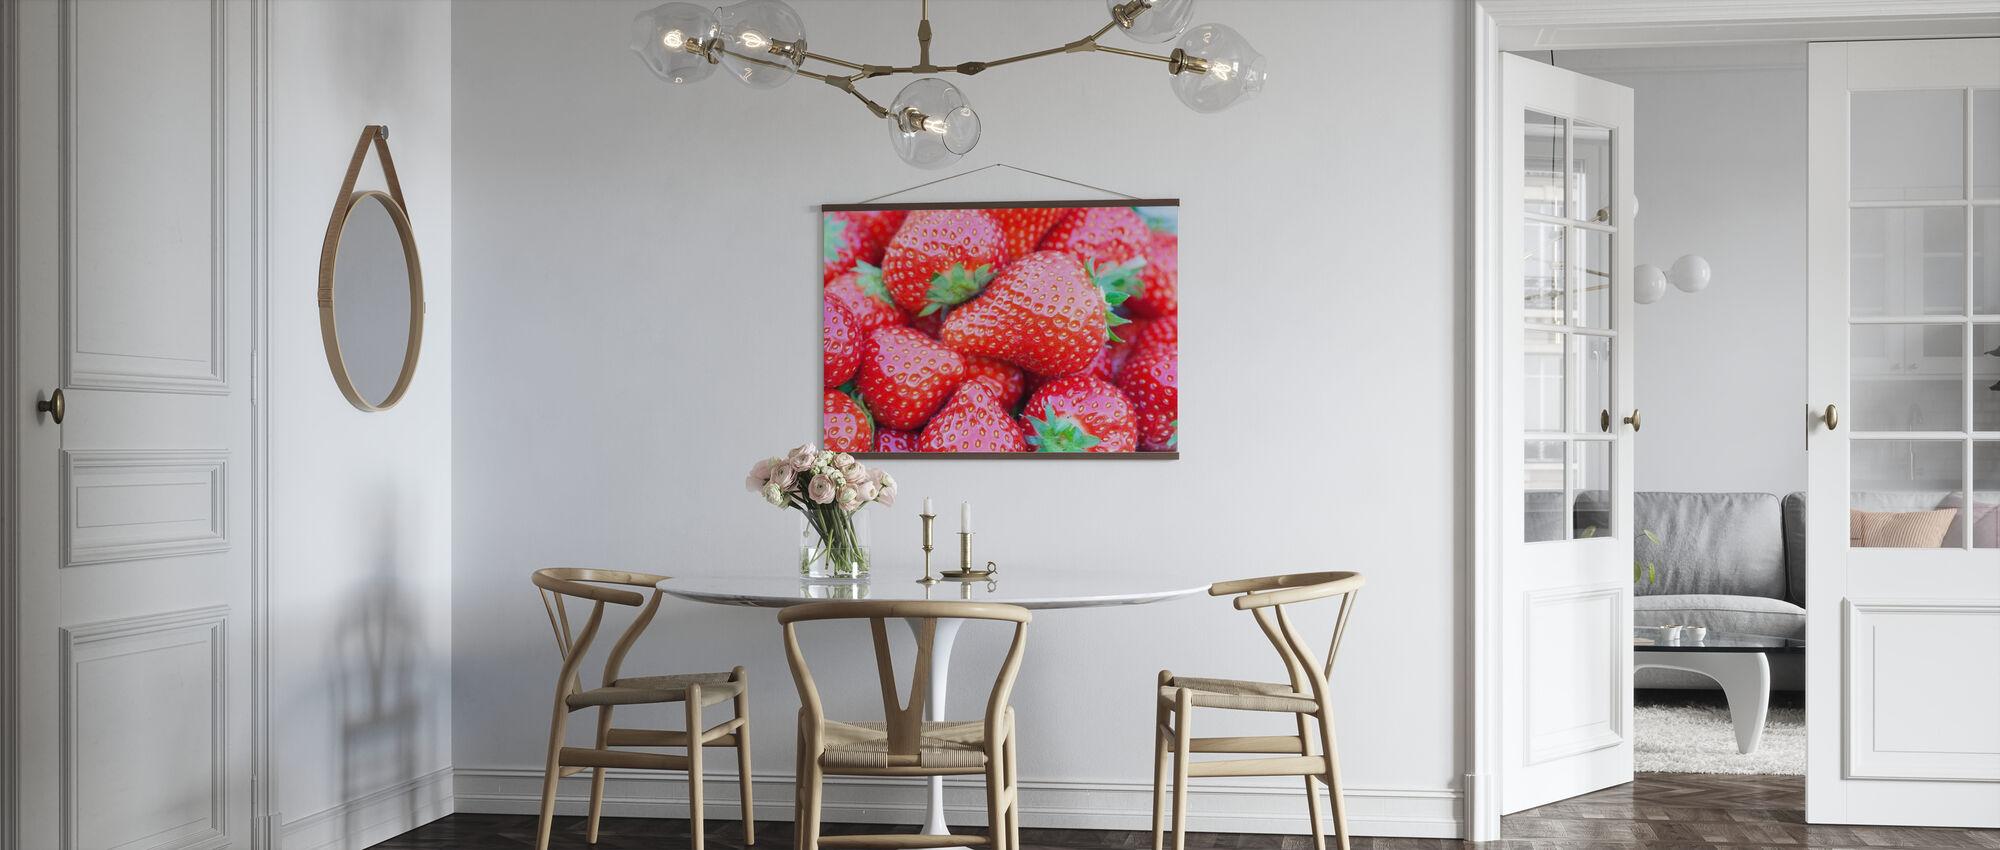 Erdbeere - Poster - Küchen